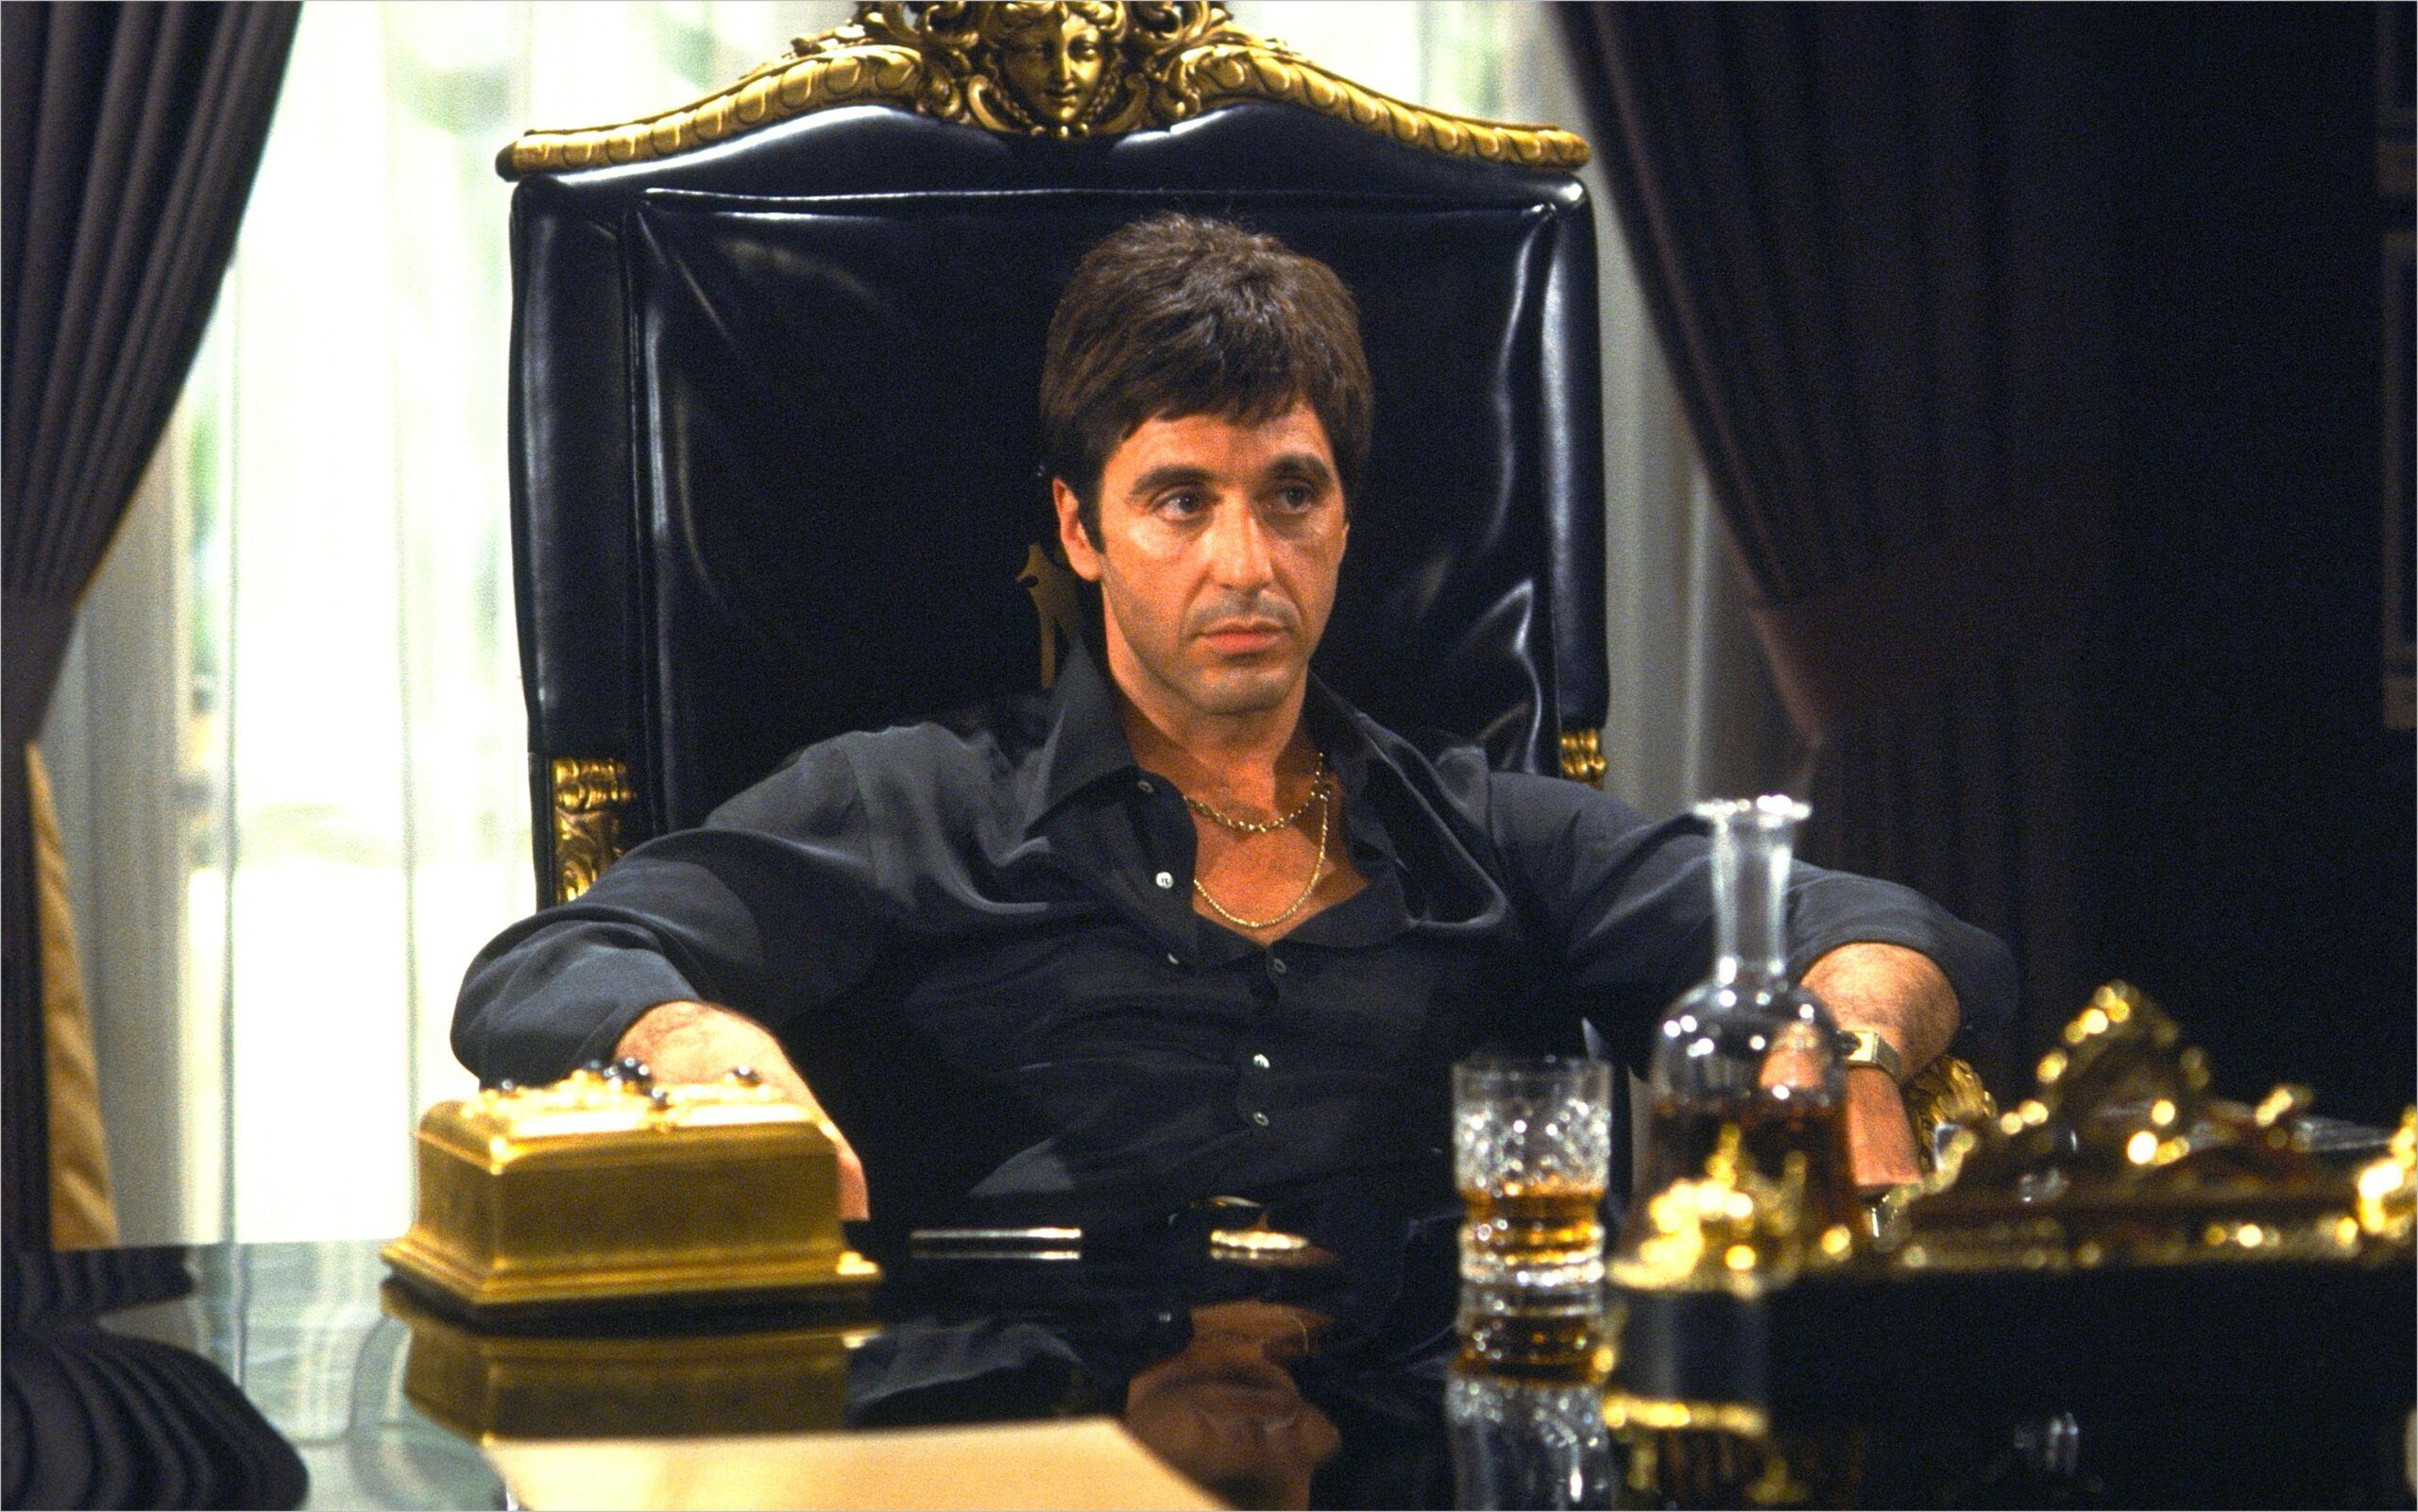 Al Pacino 4k Wallpaper in 2020 Scarface movie, Tony